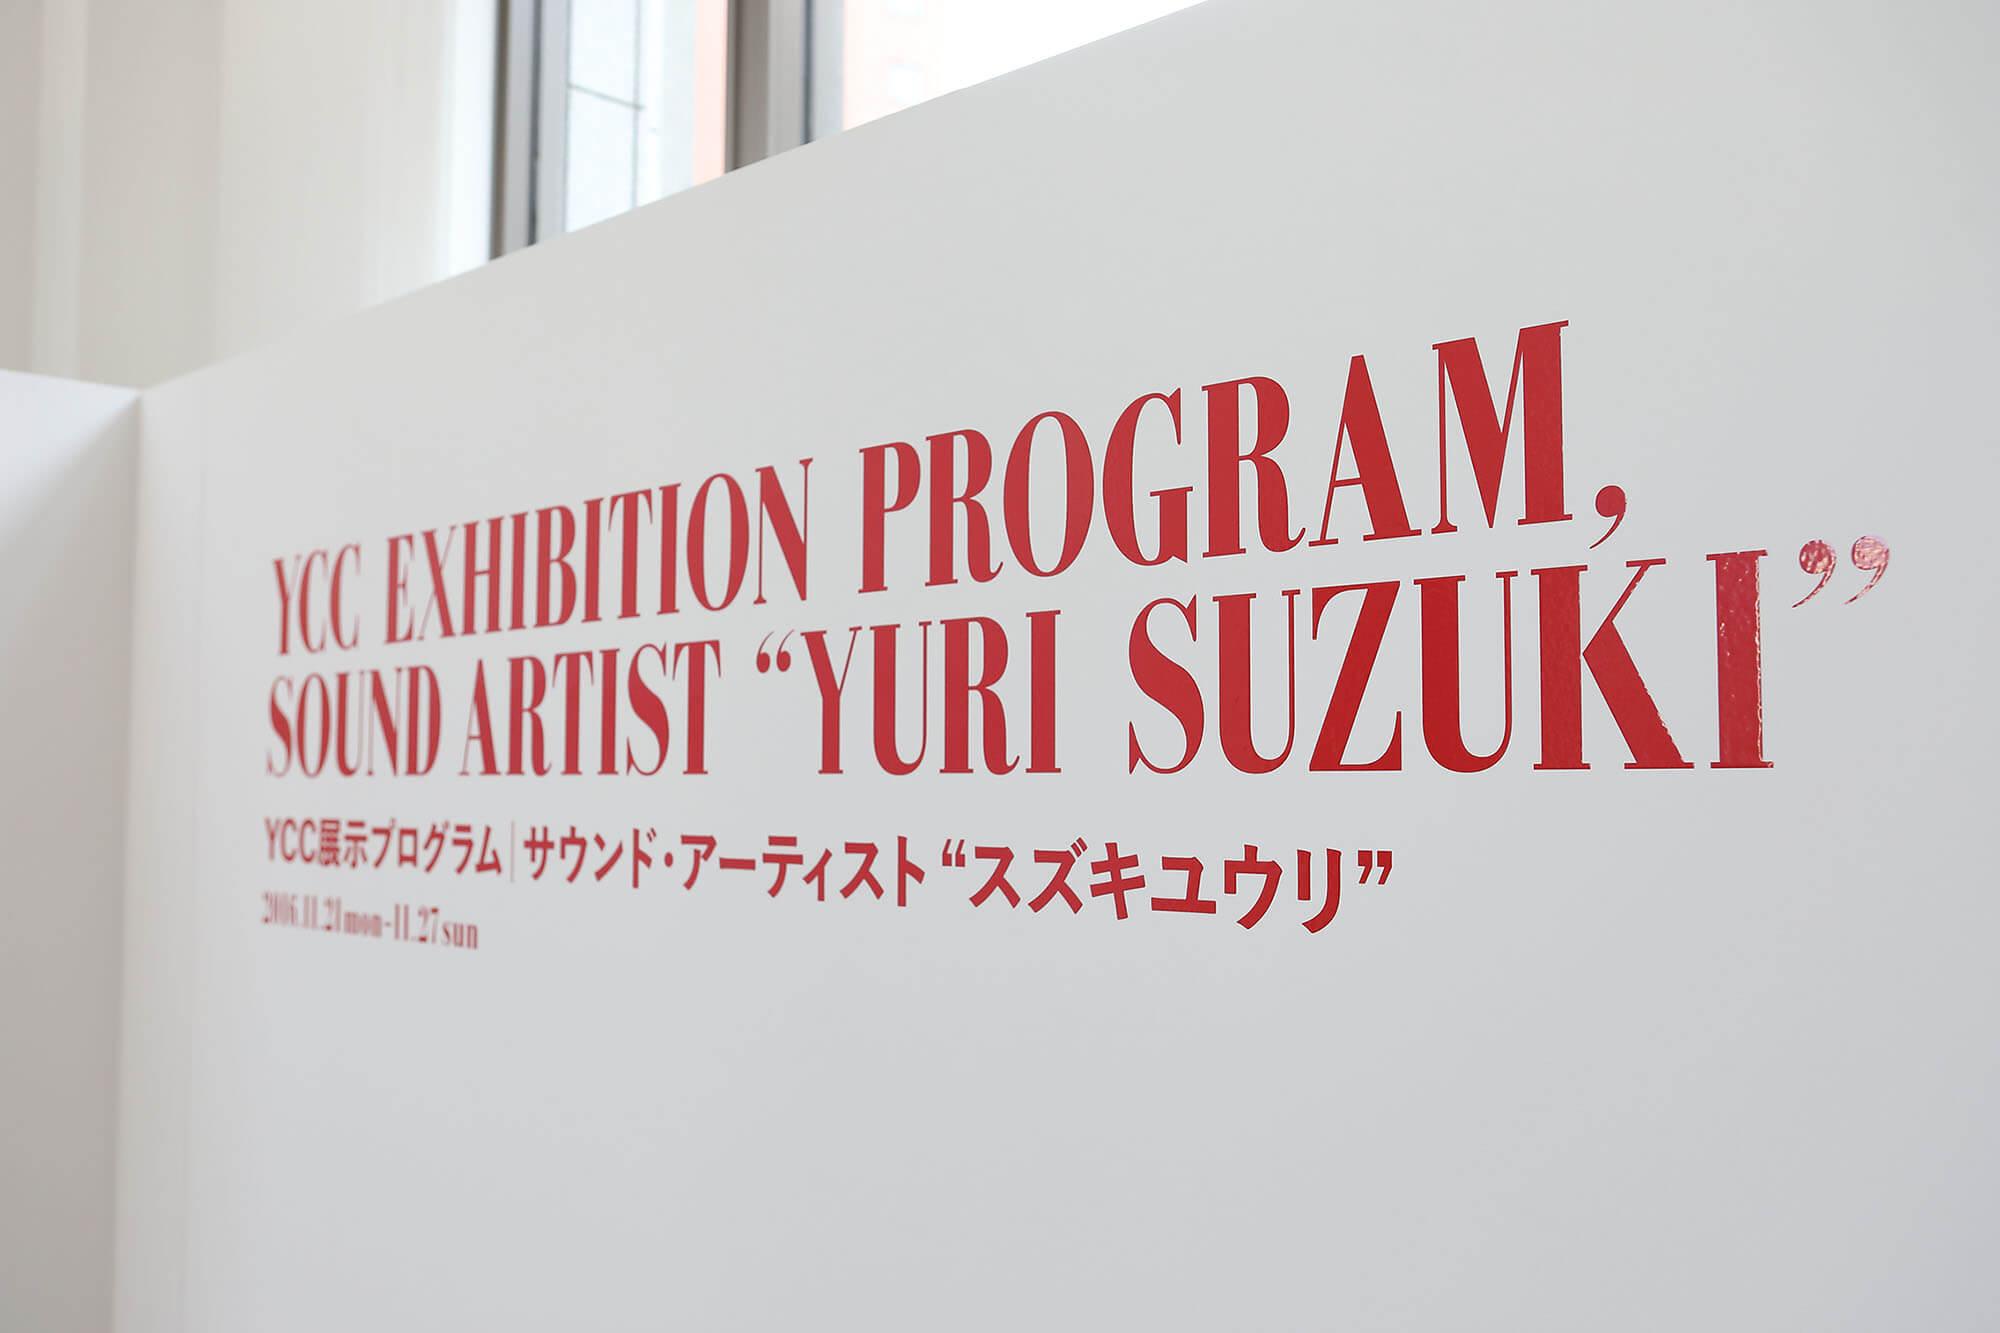 "YCC 展示プログラム / サウンド・アーティスト ""スズキユウリ""|offsociety inc. YCC Exhibition Program Sound Artist Yuri Suzuki 現代美術・アート Contemporary Art"